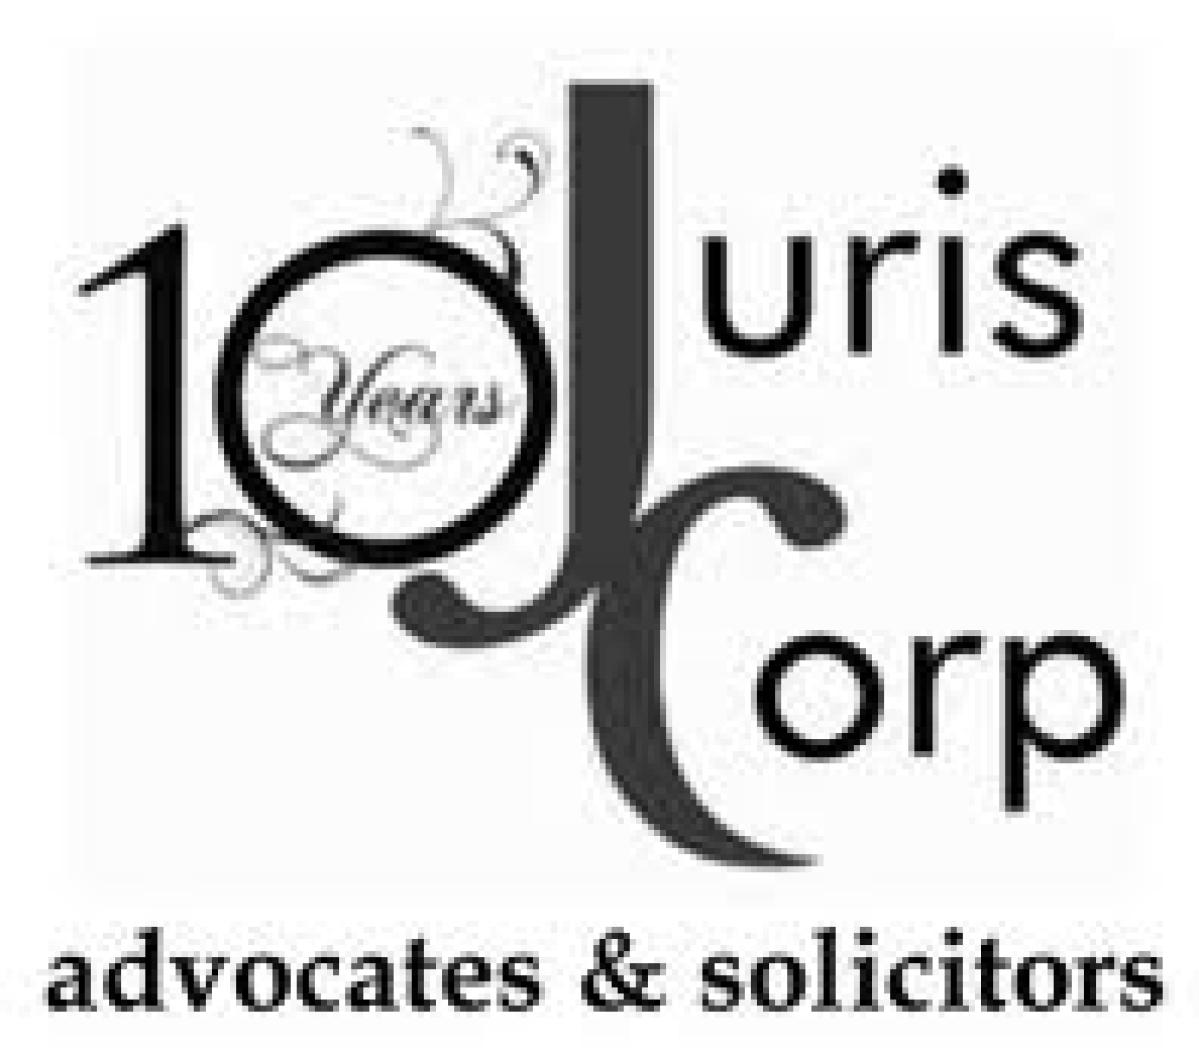 Juris Corp Partner Vandana Sekhri quits to explore other opportunities